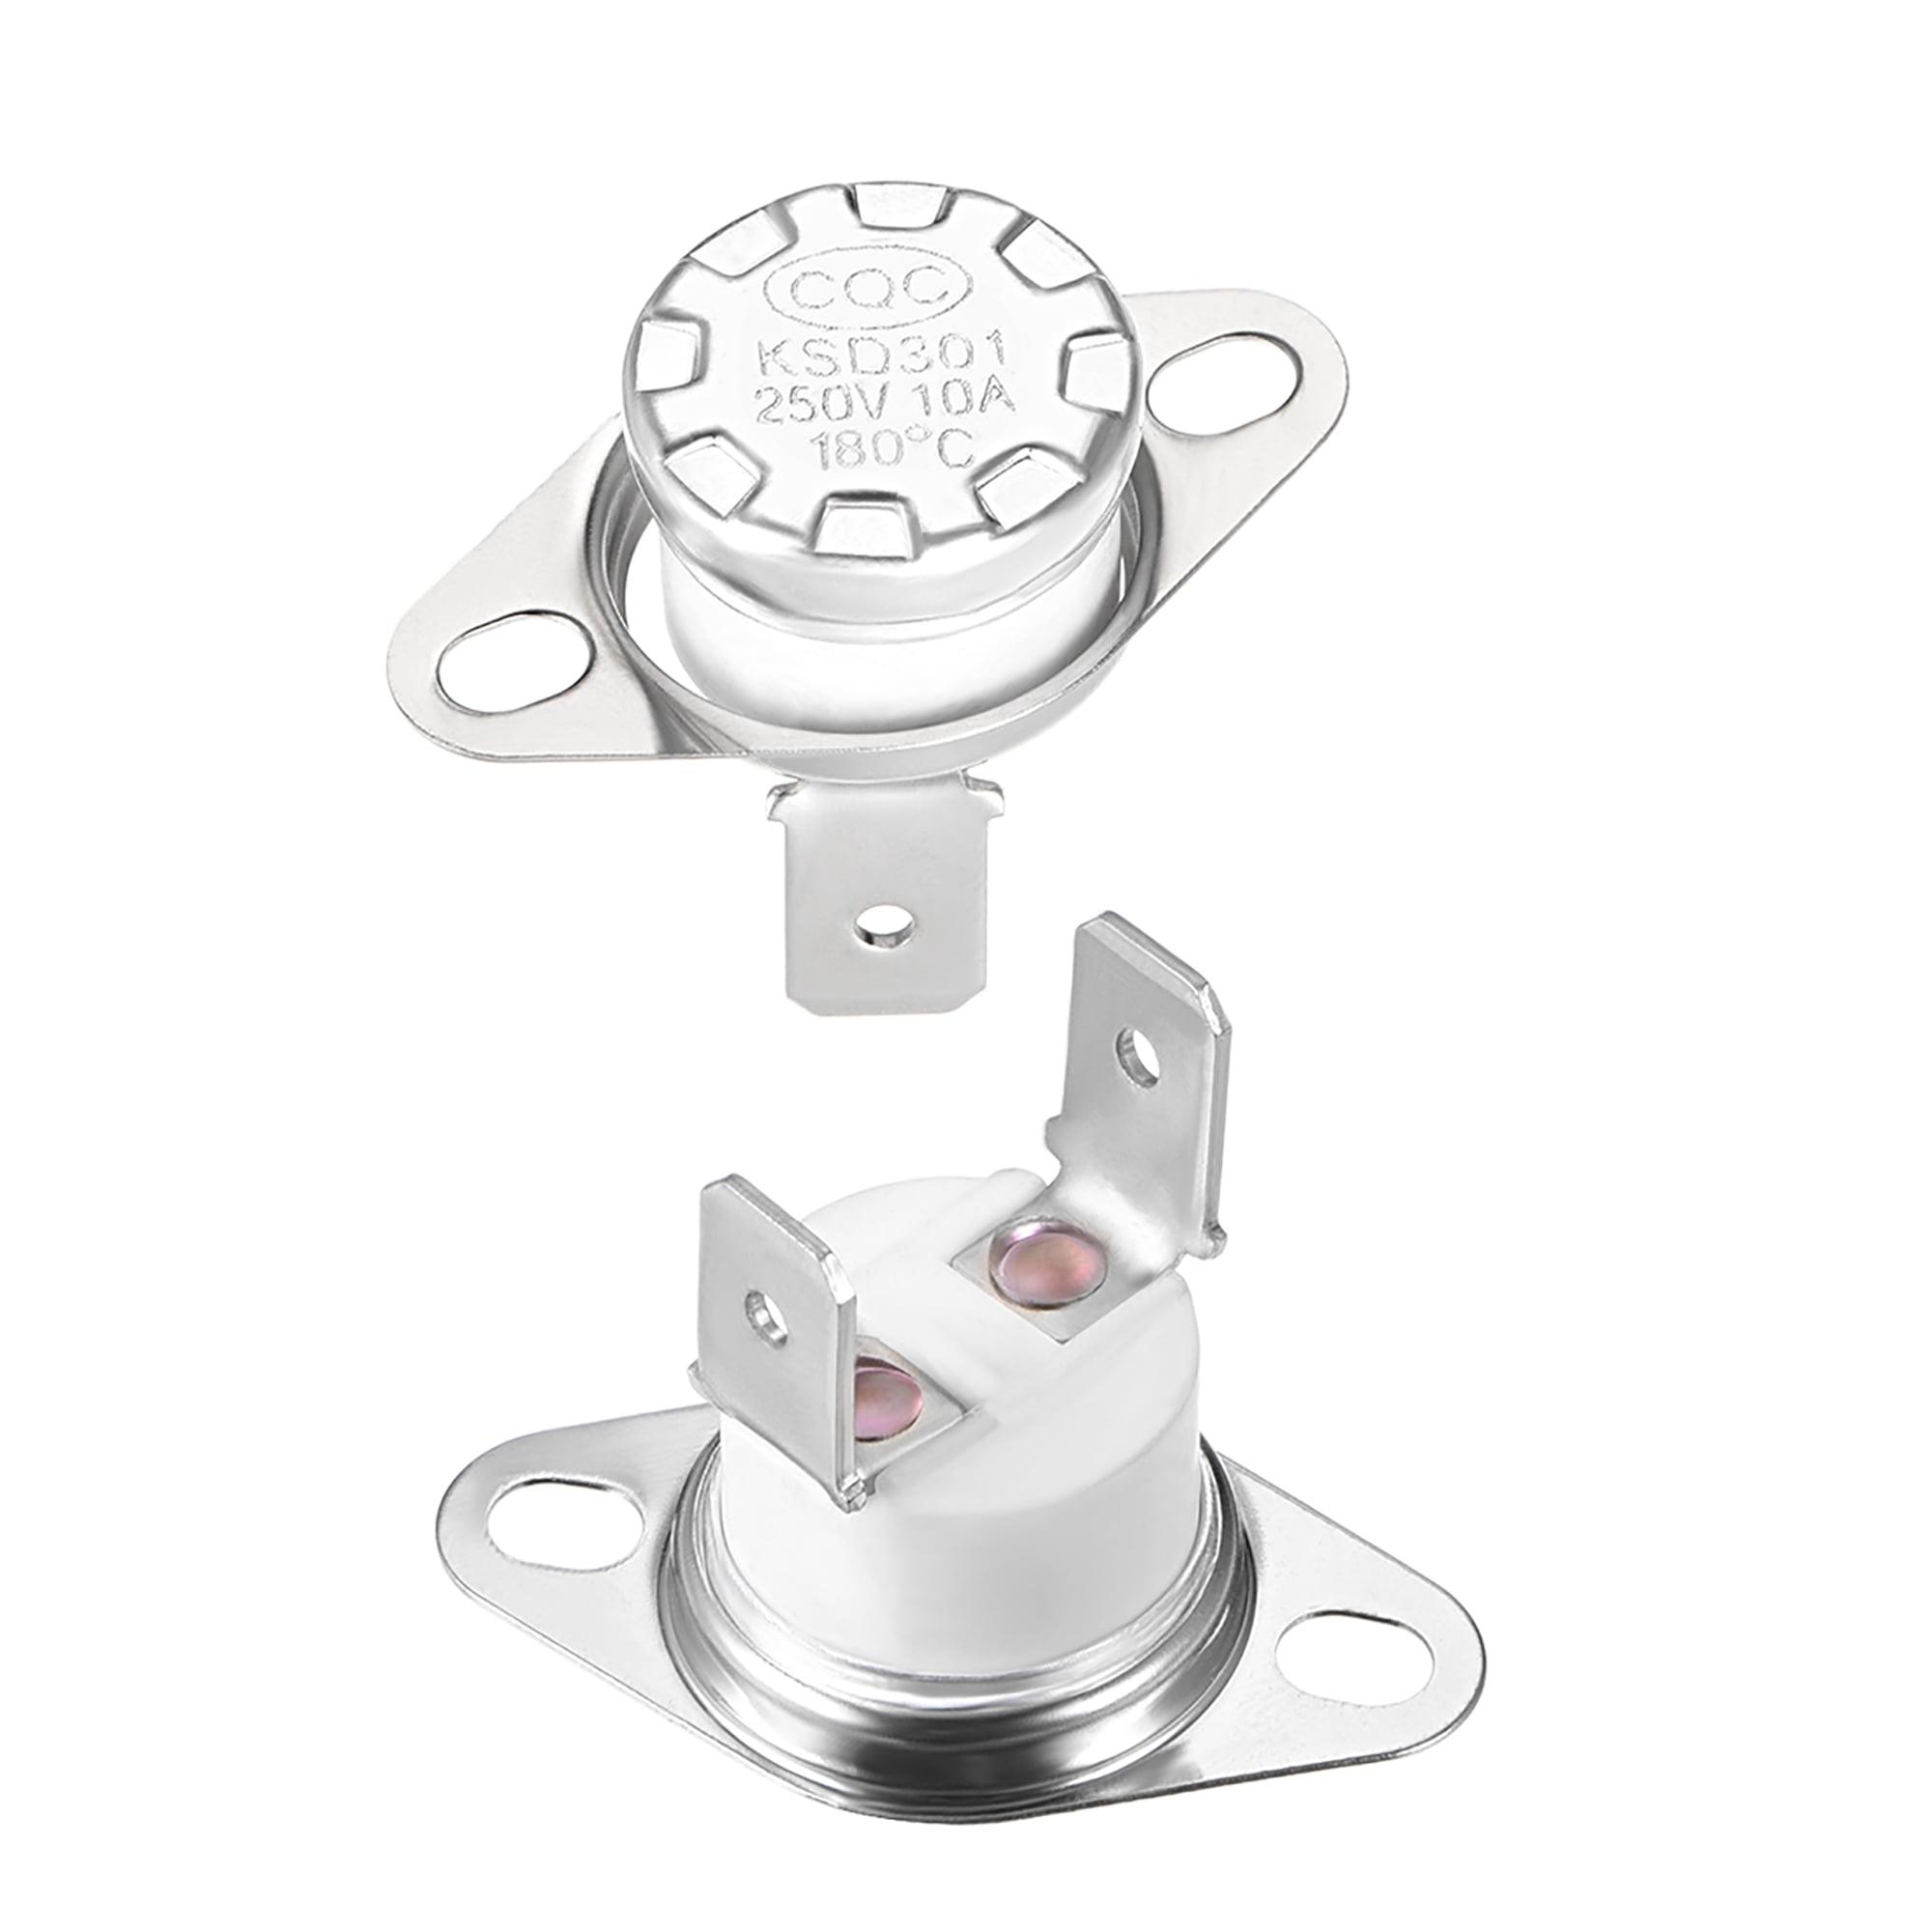 Temperature Control Switch , Thermostat , KSD301 180°C , 10A , Normally Closed N.C 2pcs - image 4 de 4